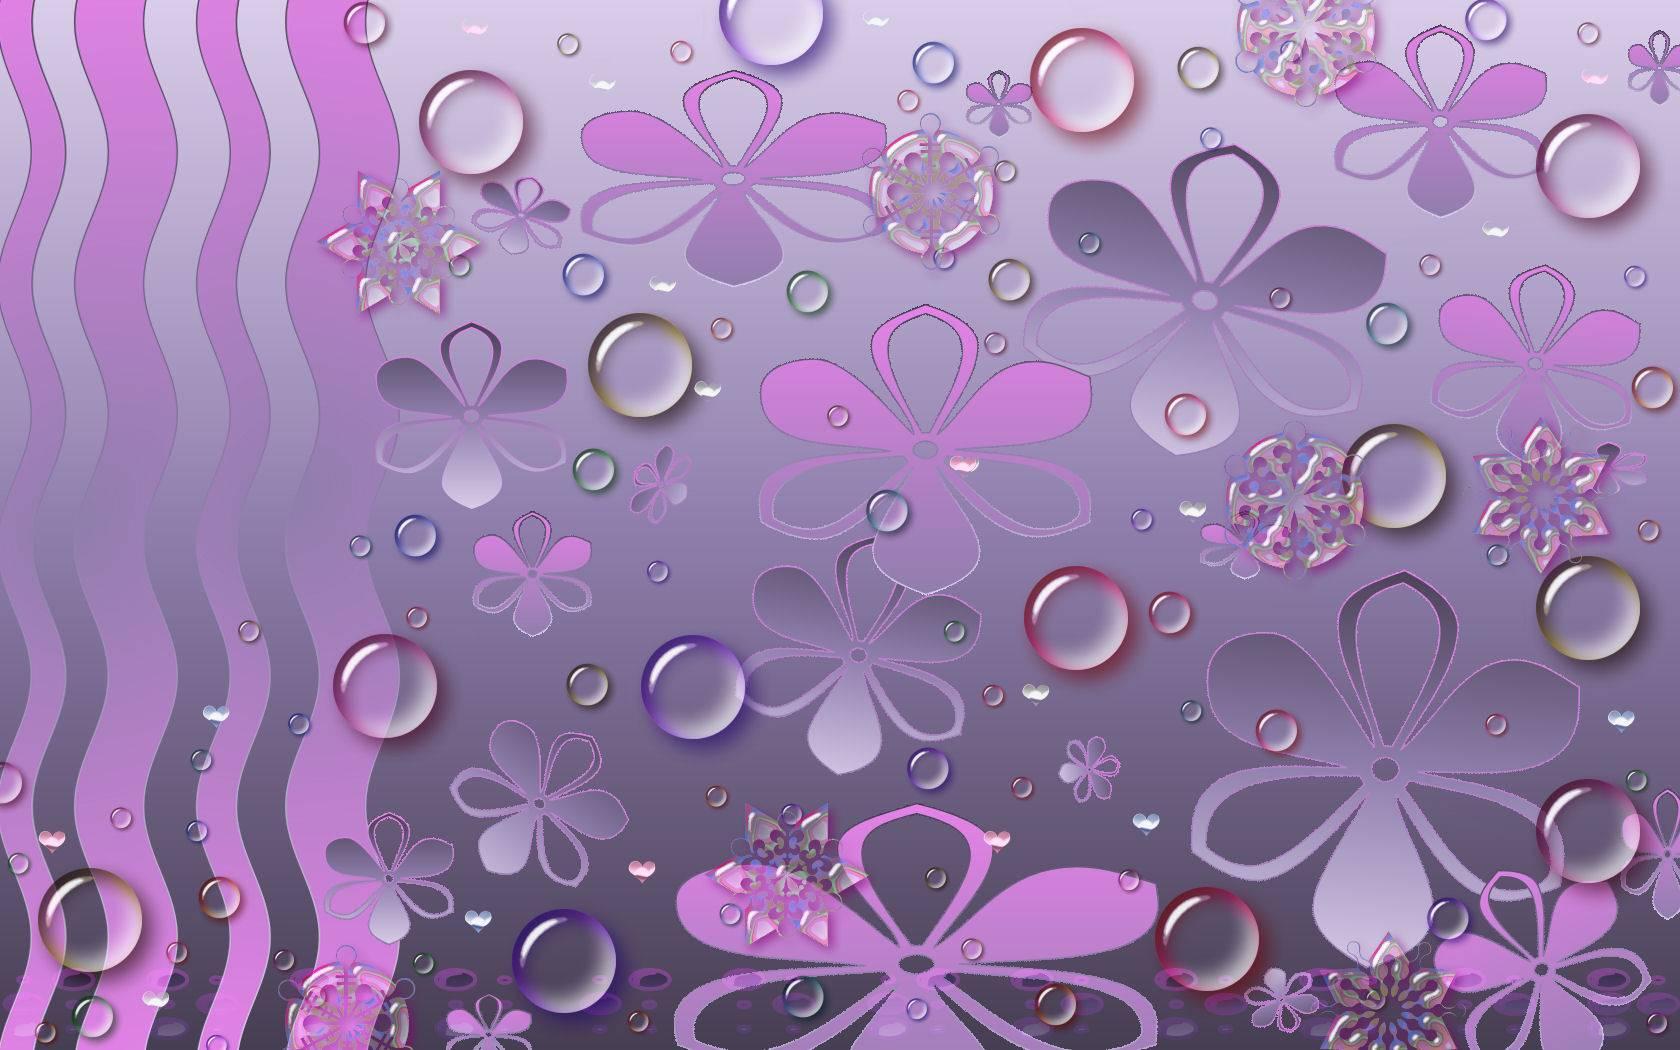 spookie purple wave wallpaper   pink and purple Wallpaper 1680x1050